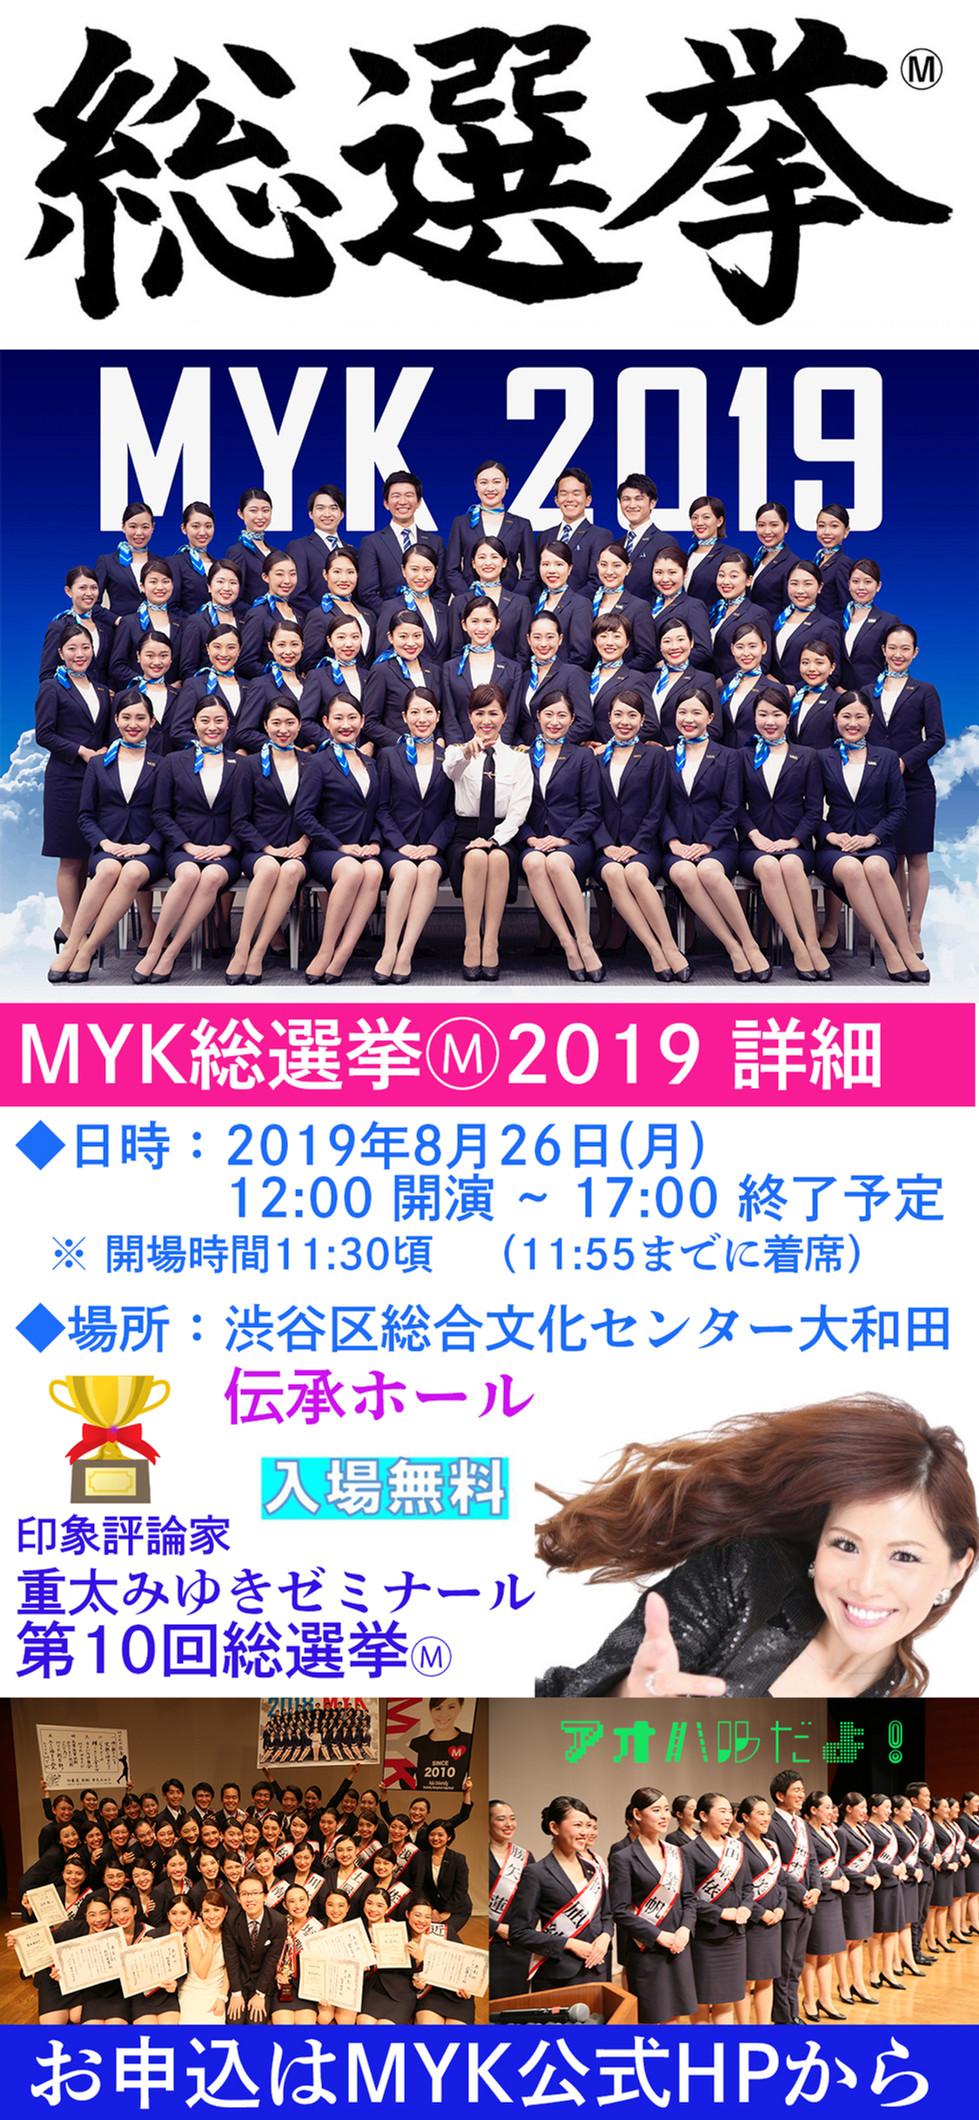 MYK総選挙Ⓜ︎2019 入場無料 詳細情報